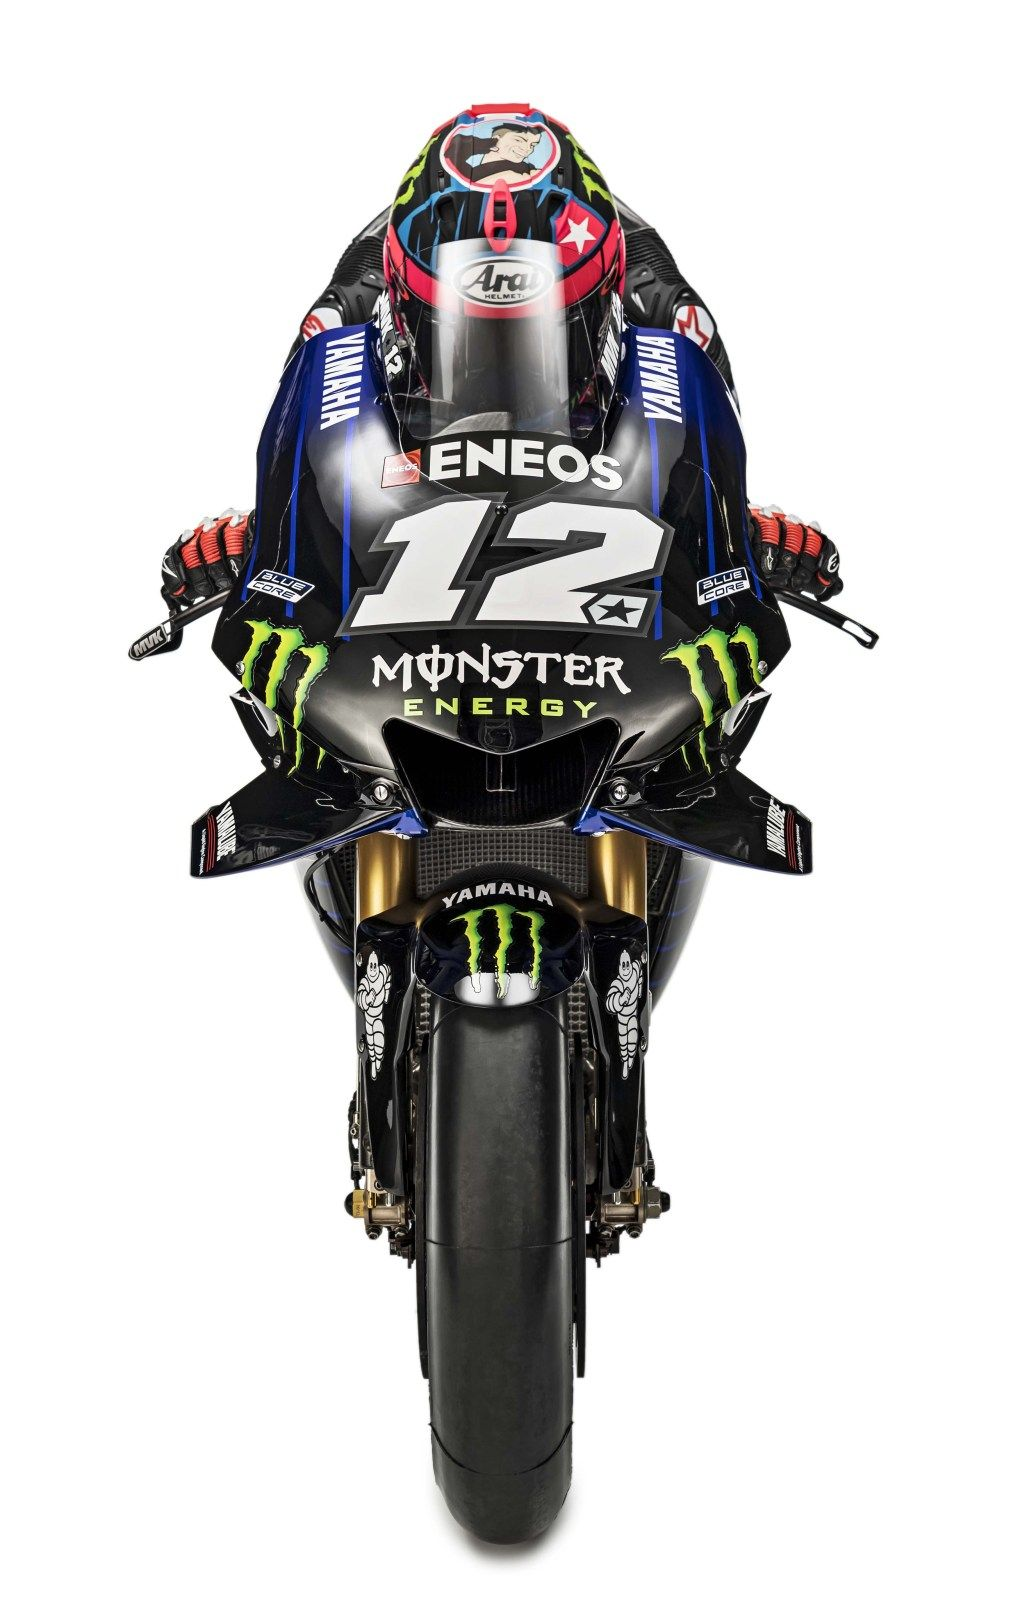 """Beast Mode On"" Livery Debuts for Monster Yamaha MotoGP"